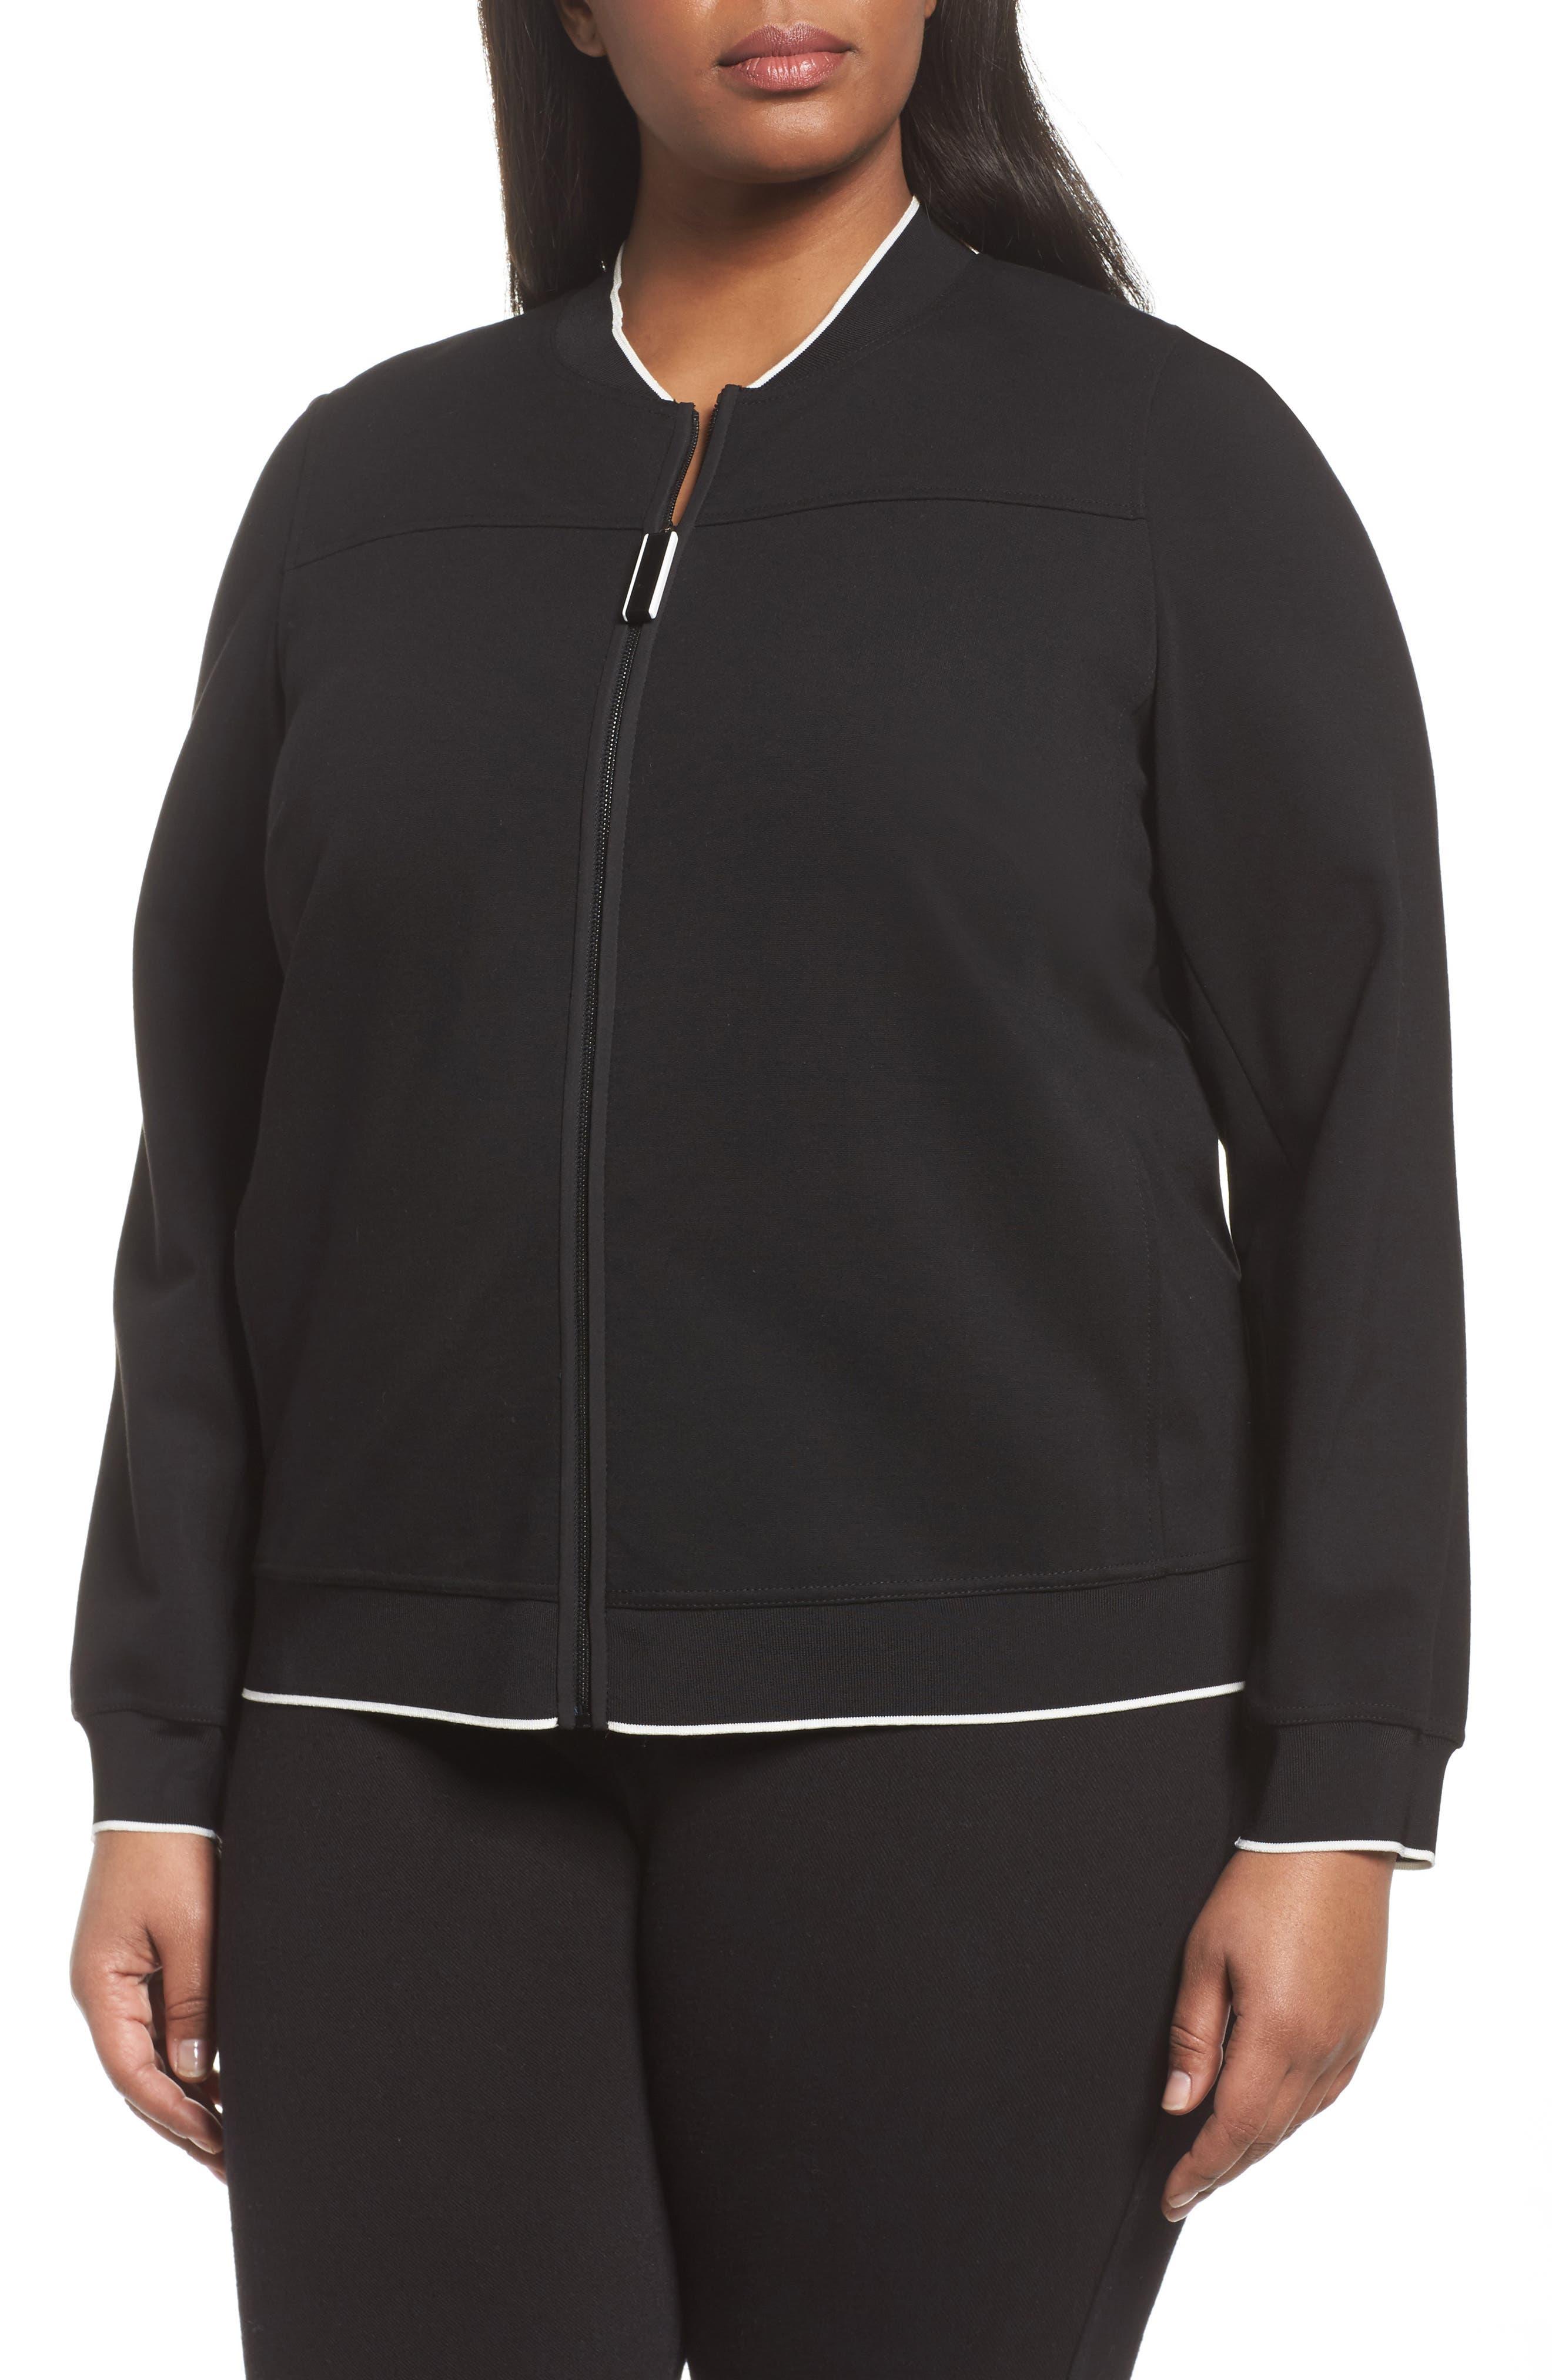 Alison Zip Front Jacket,                         Main,                         color, Black